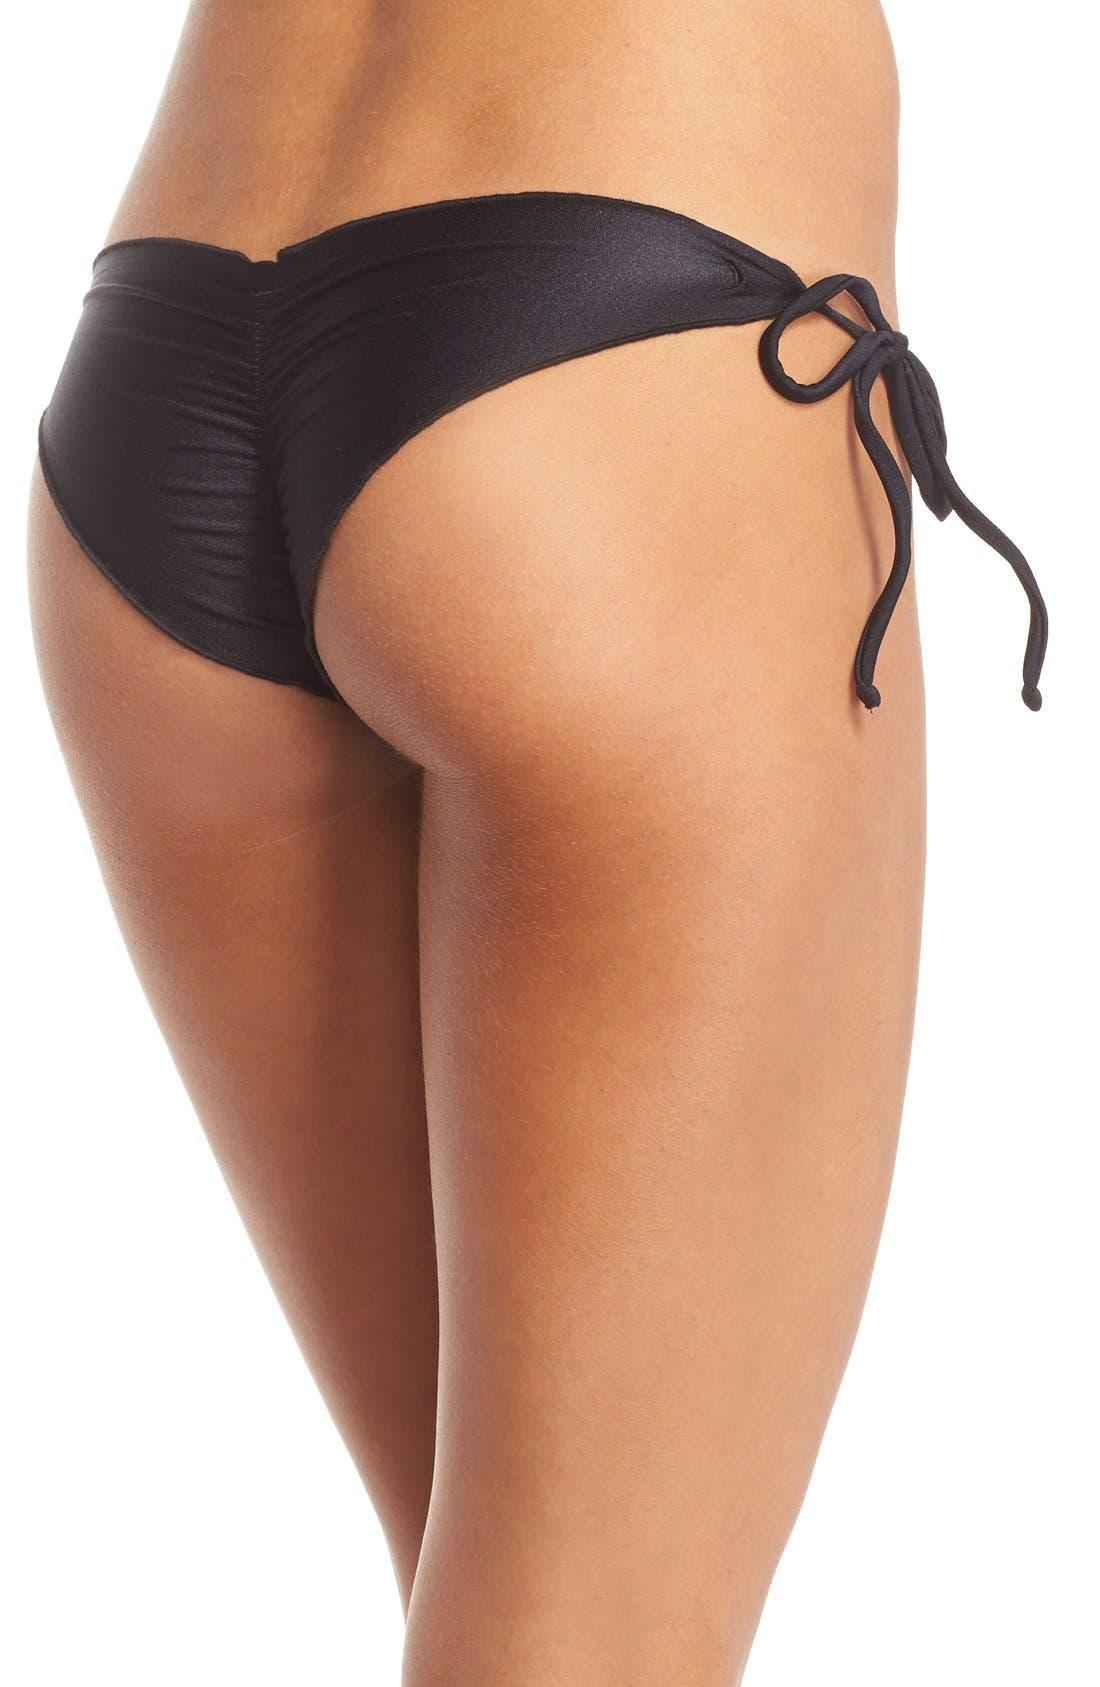 Alternate Image 1 Selected - Luli Fama 'Wavy' Brazilian Side Tie Bikini Bottoms